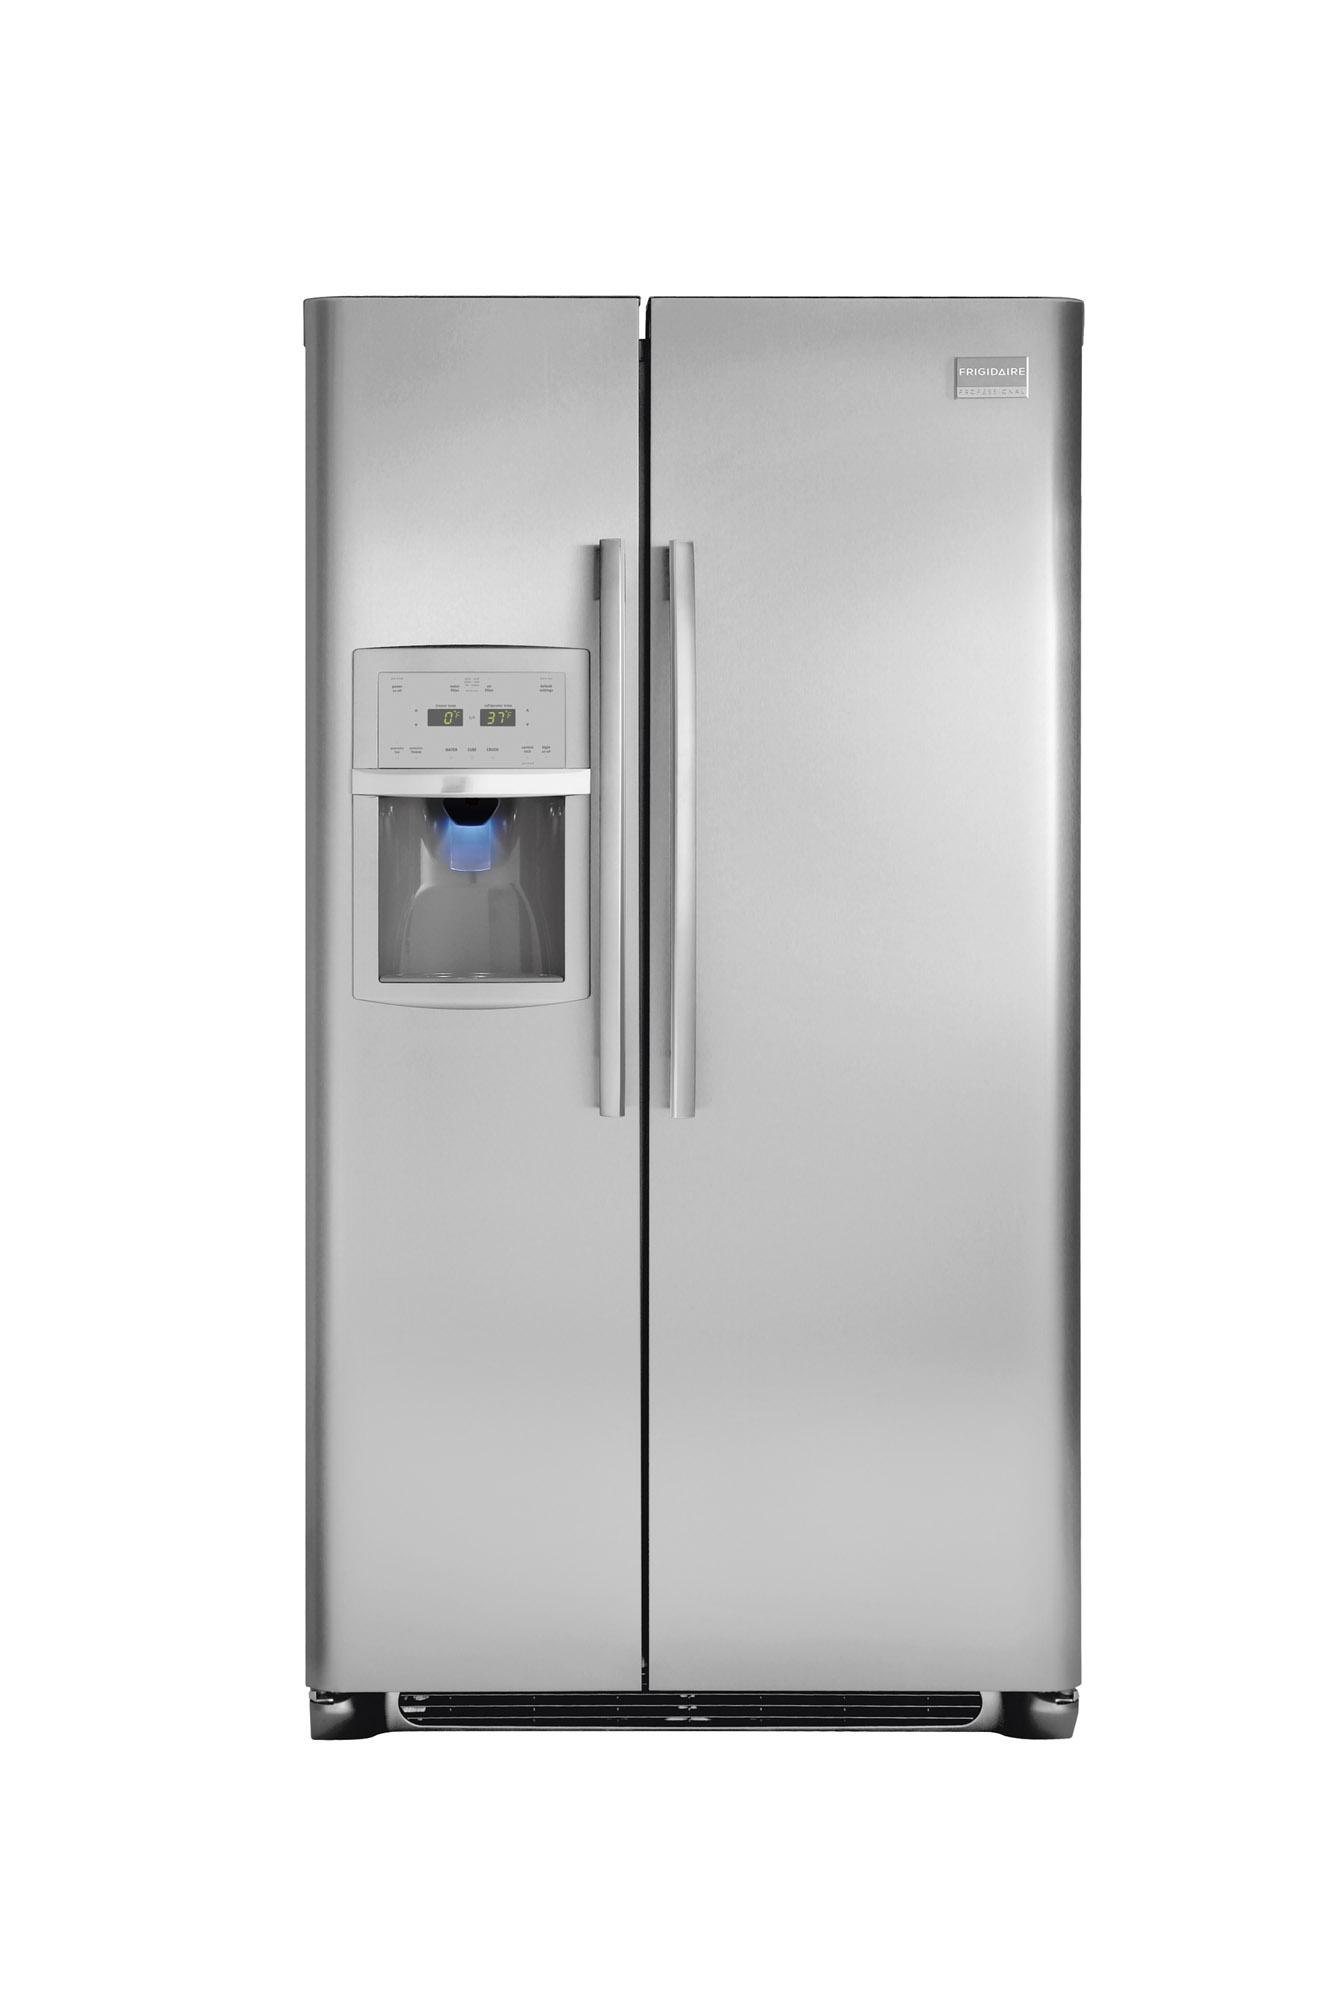 Frigidaire Refrigerator Model FPHS2387KF5 Parts